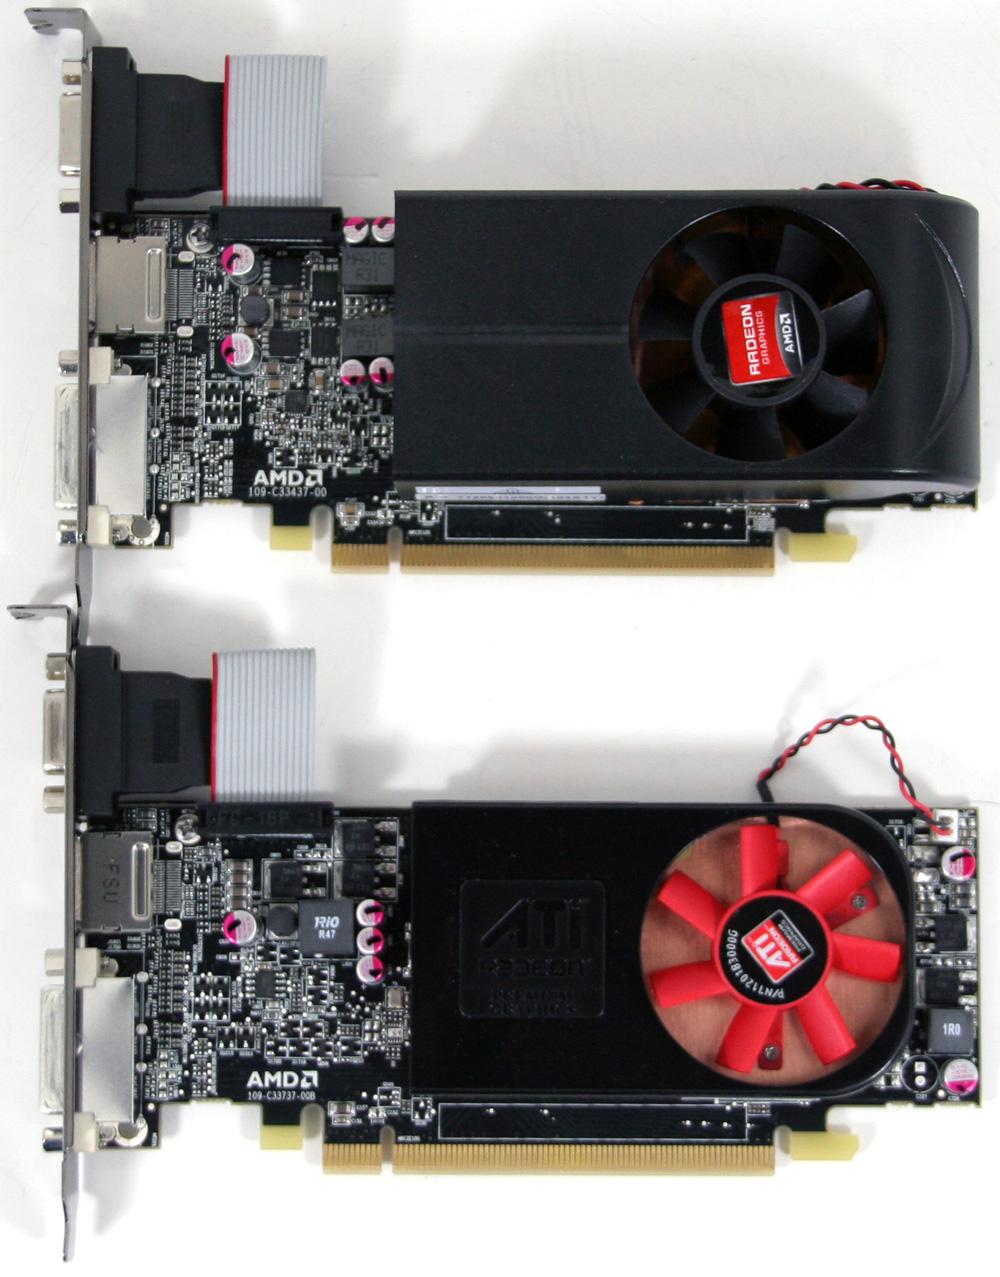 AMD's Radeon HD 6670 & Radeon HD 6570: Two's Company, Sub ...